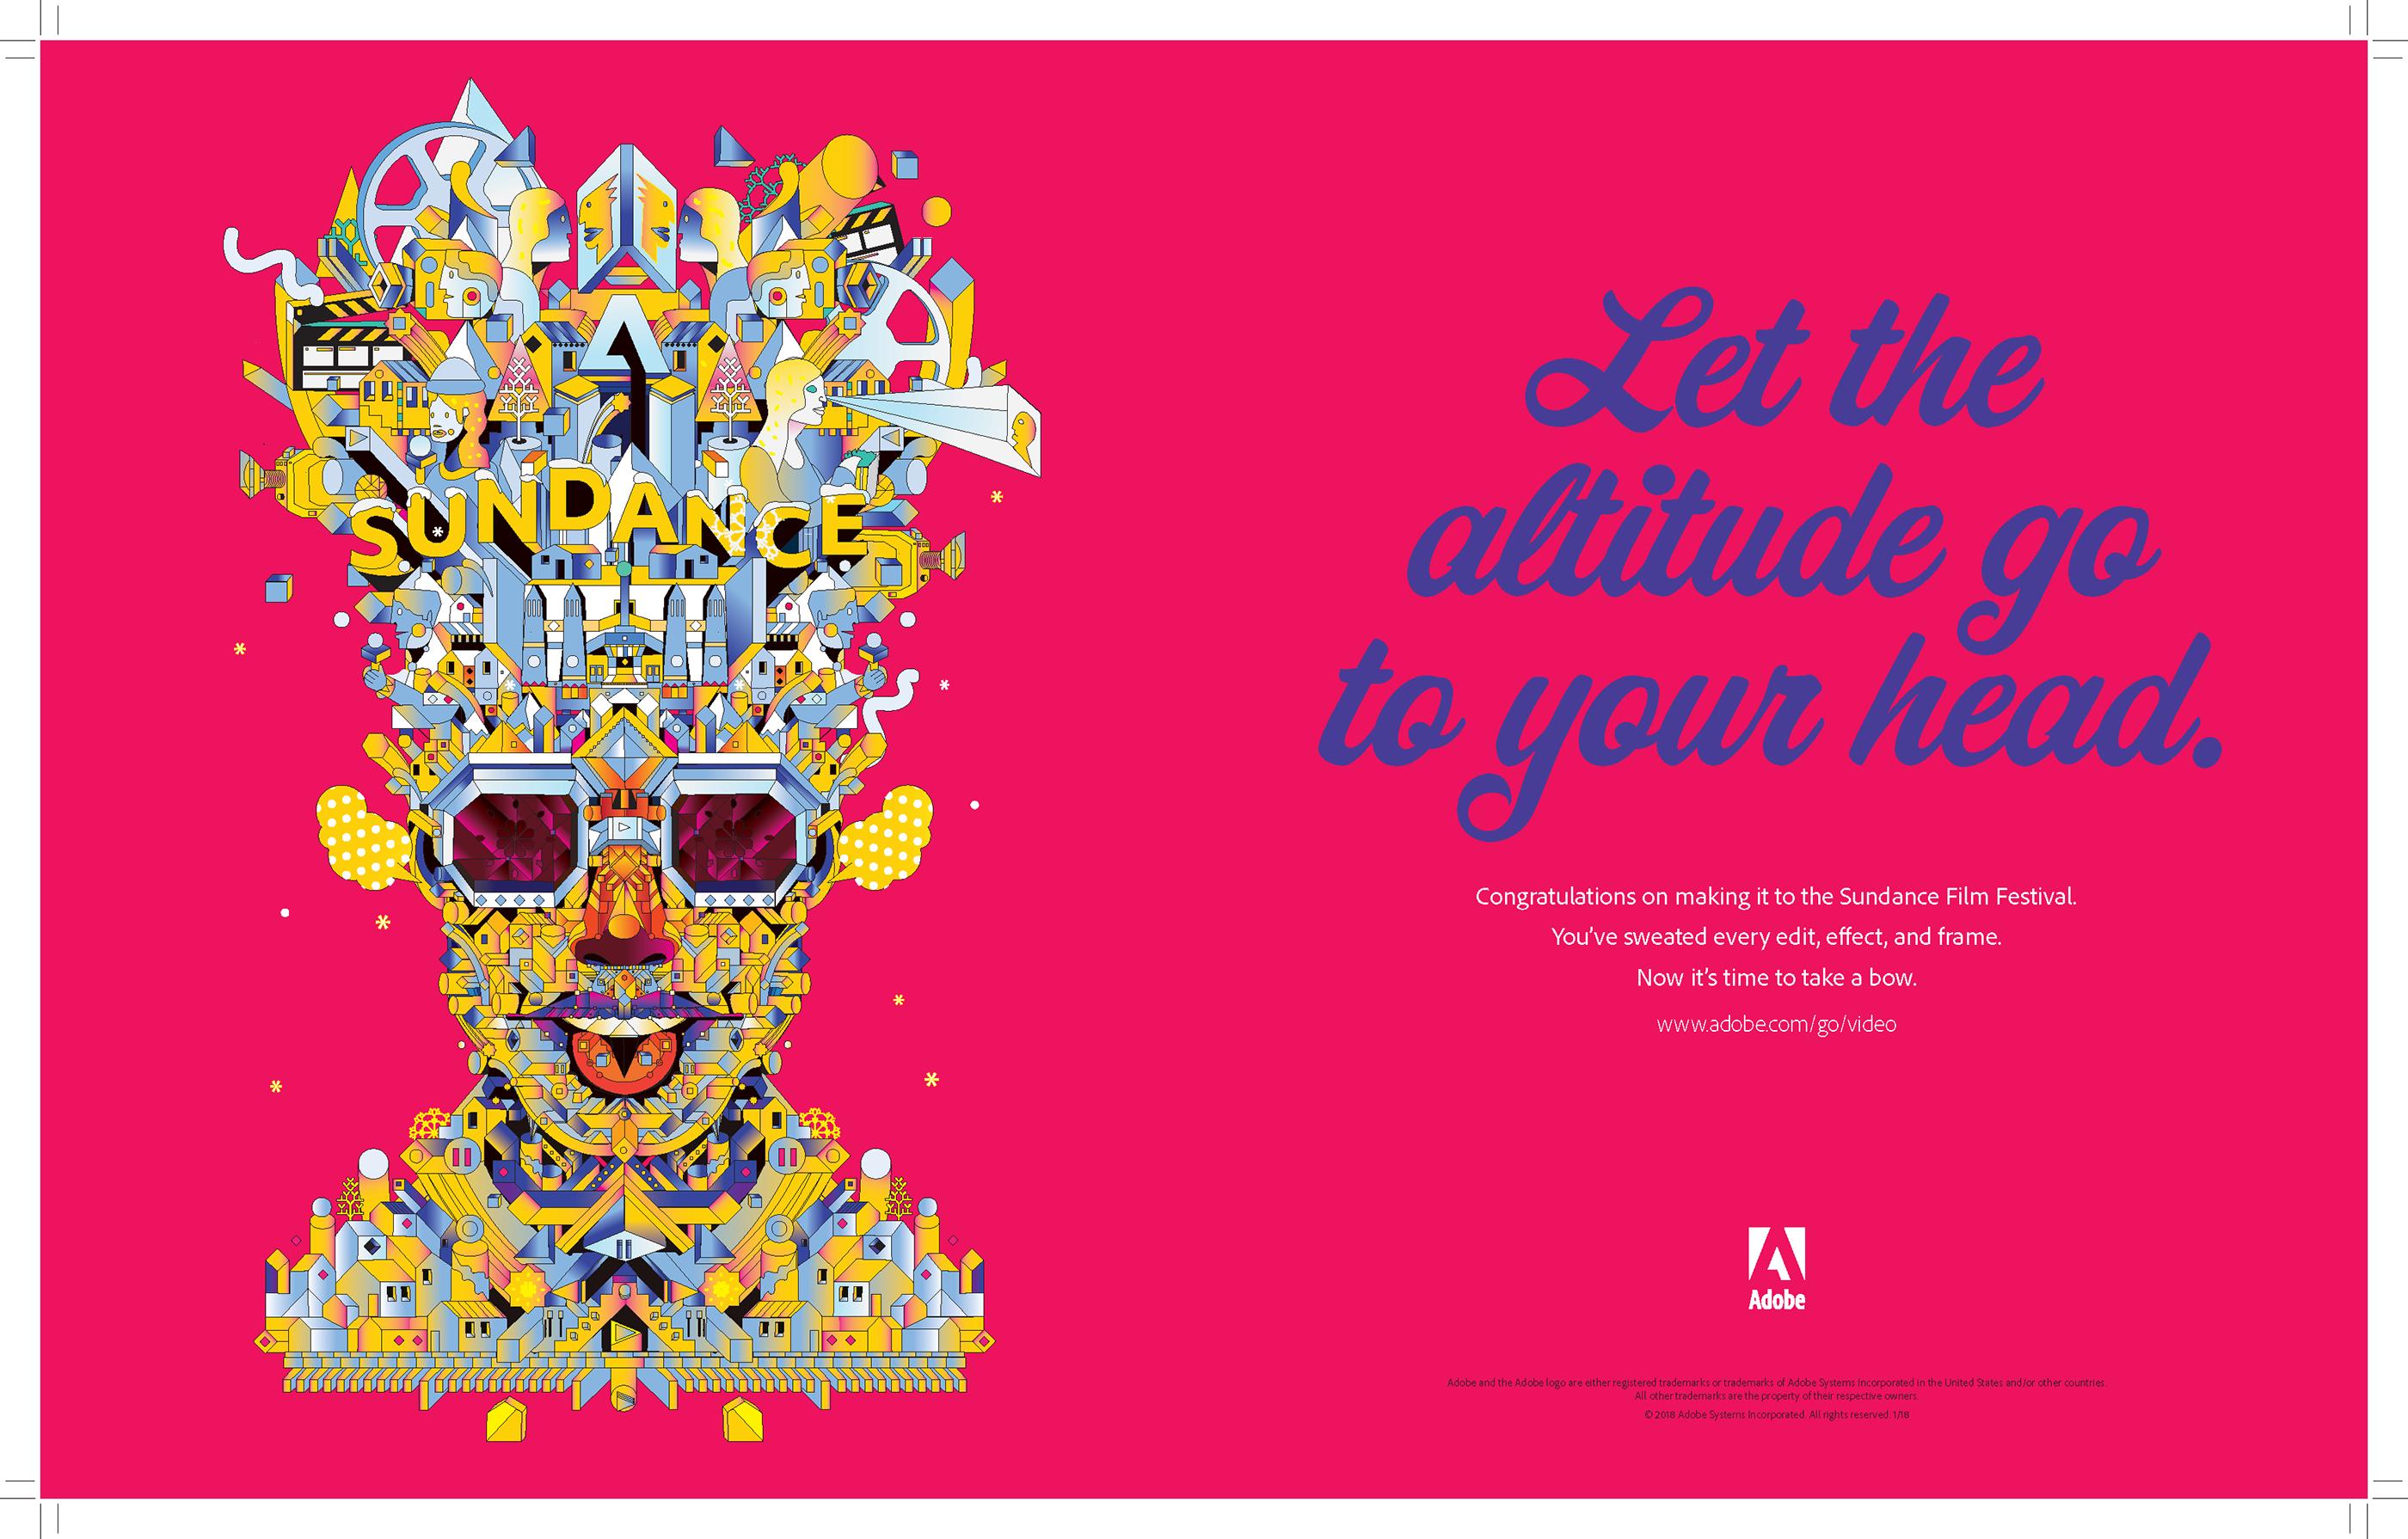 Adobe@Sundance Imagery on Behance